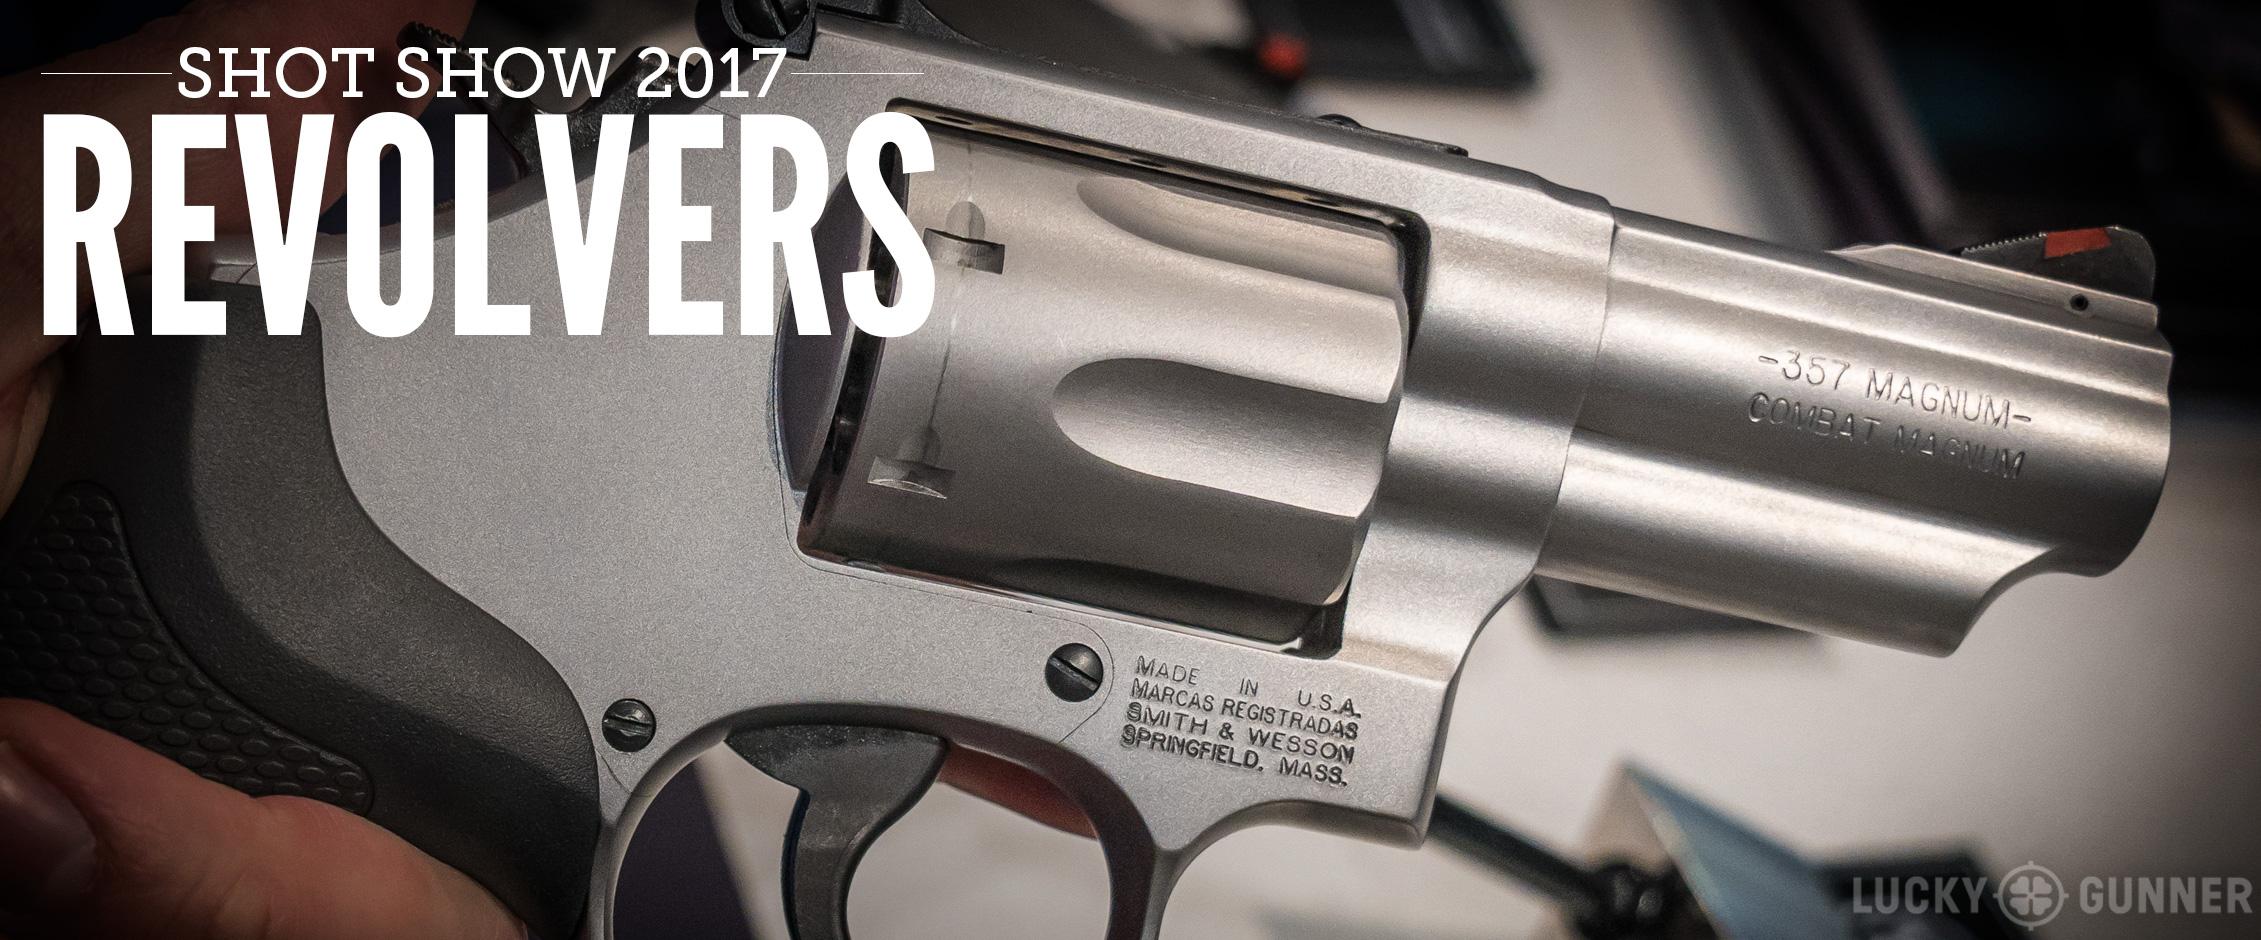 SHOT Show 2017 Revolvers Everywhere